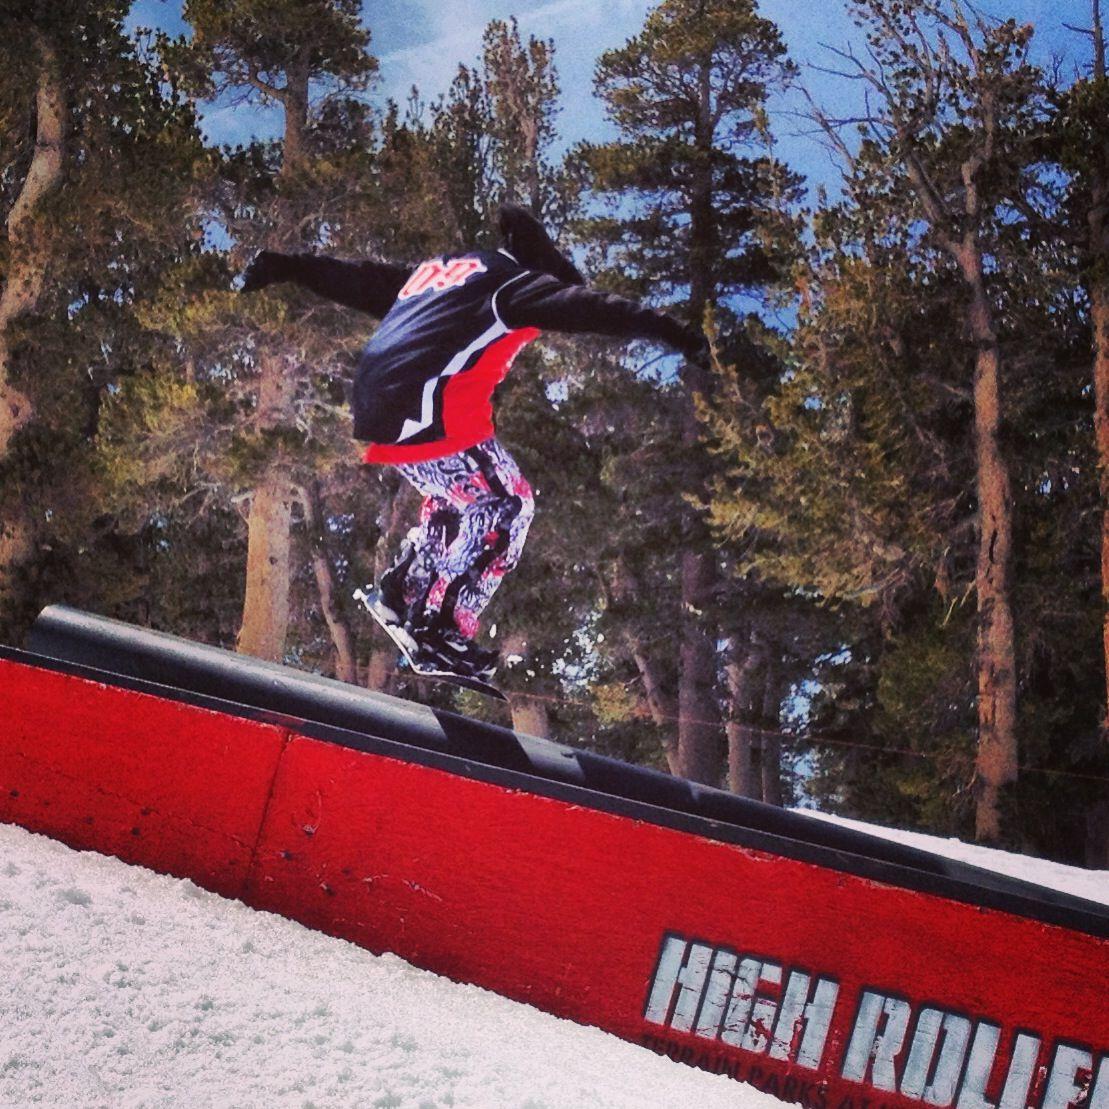 Hitting That Rail At High Roller Terrain Park At Heavenly Mountain Ski Resort Www Arctivity Com Ski Resort Heavenly Resort Resort